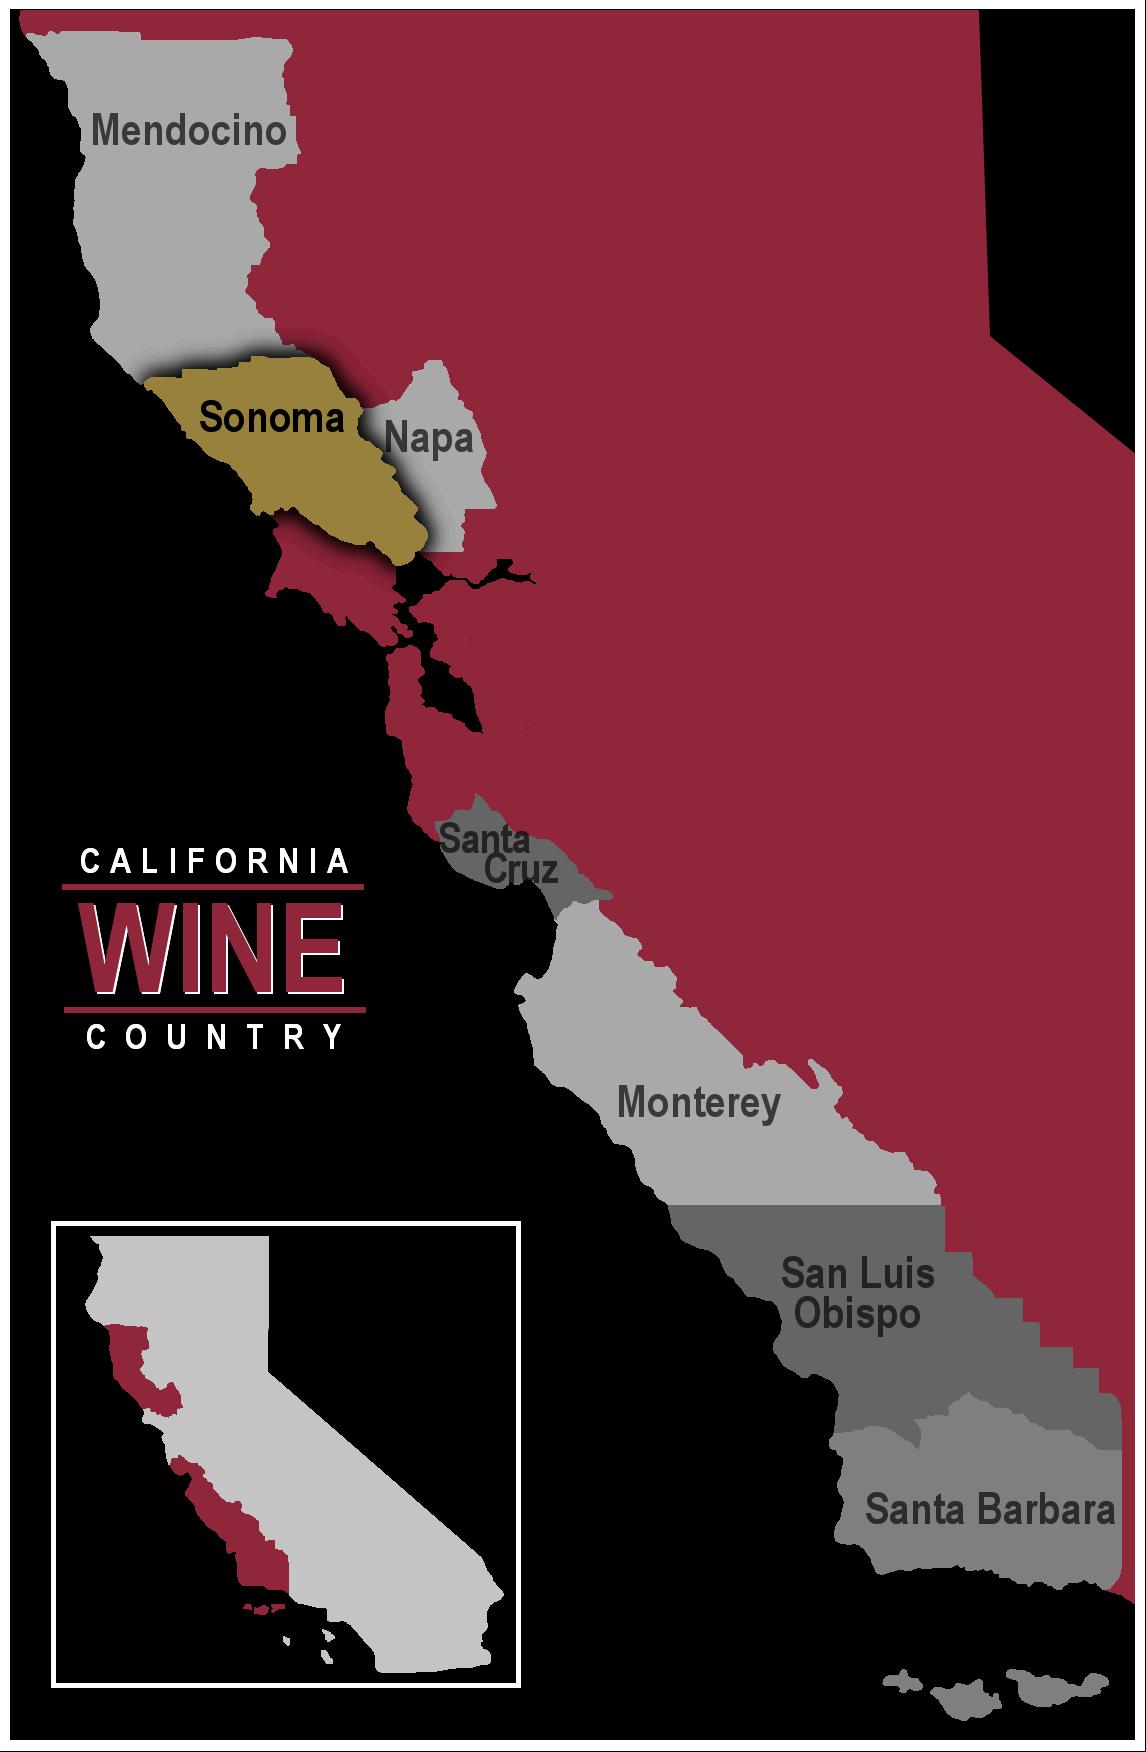 Map of California wine region Sonoma